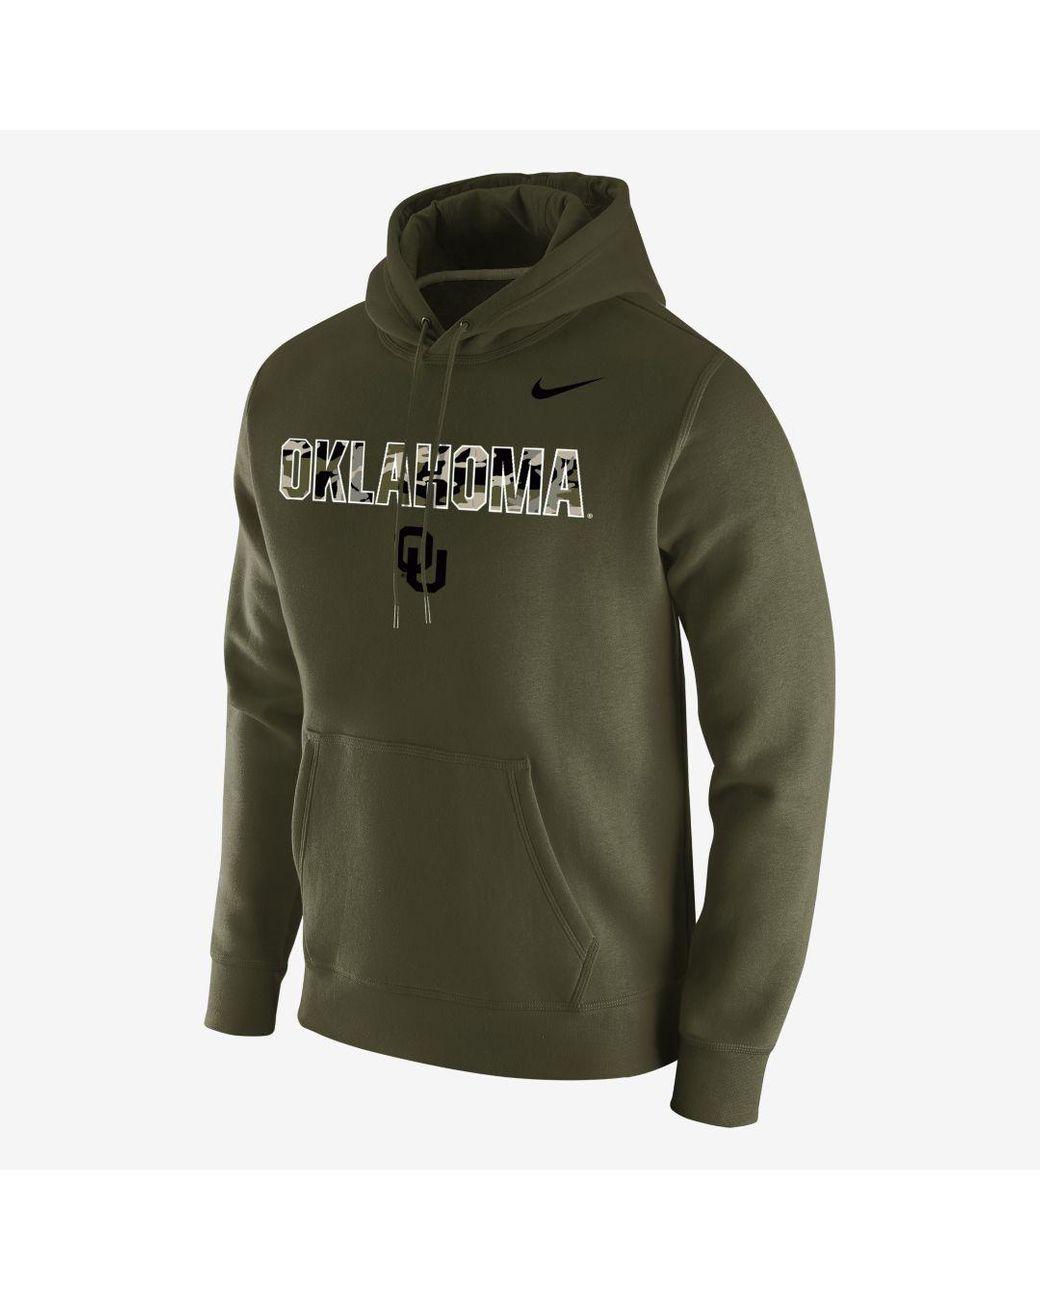 Nike College Club (Oklahoma State) Men's Pullover Hoodie